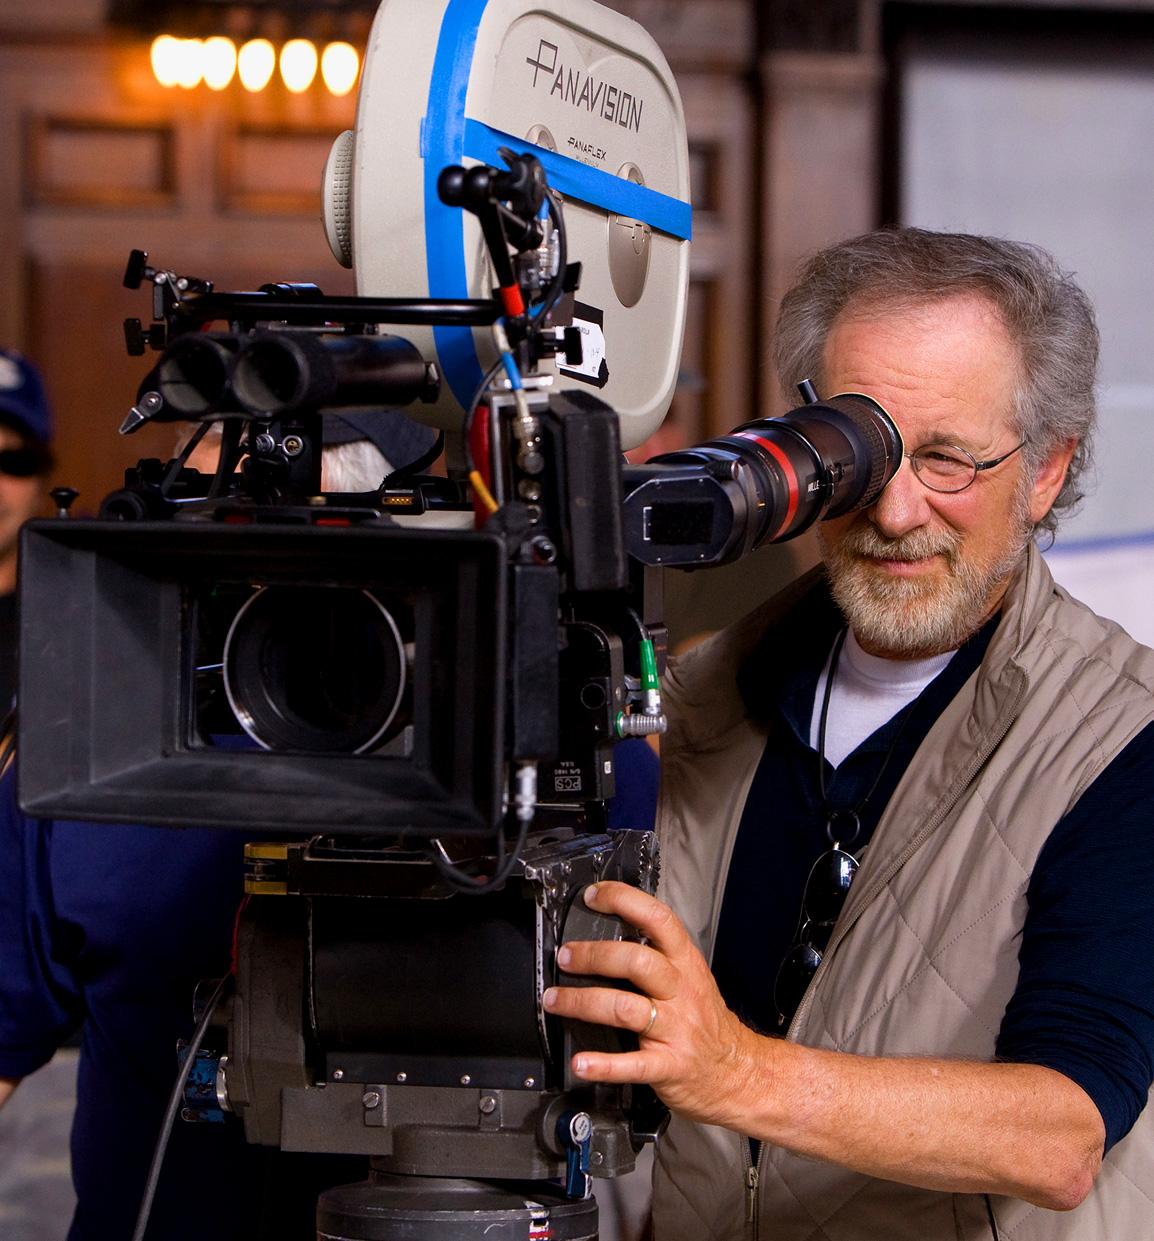 http://4.bp.blogspot.com/-6Qoa4Ql1las/TmhrKiYSYlI/AAAAAAAAB14/BRj1aueT6lU/s1600/Steven-Spielberg-Camera.jpg